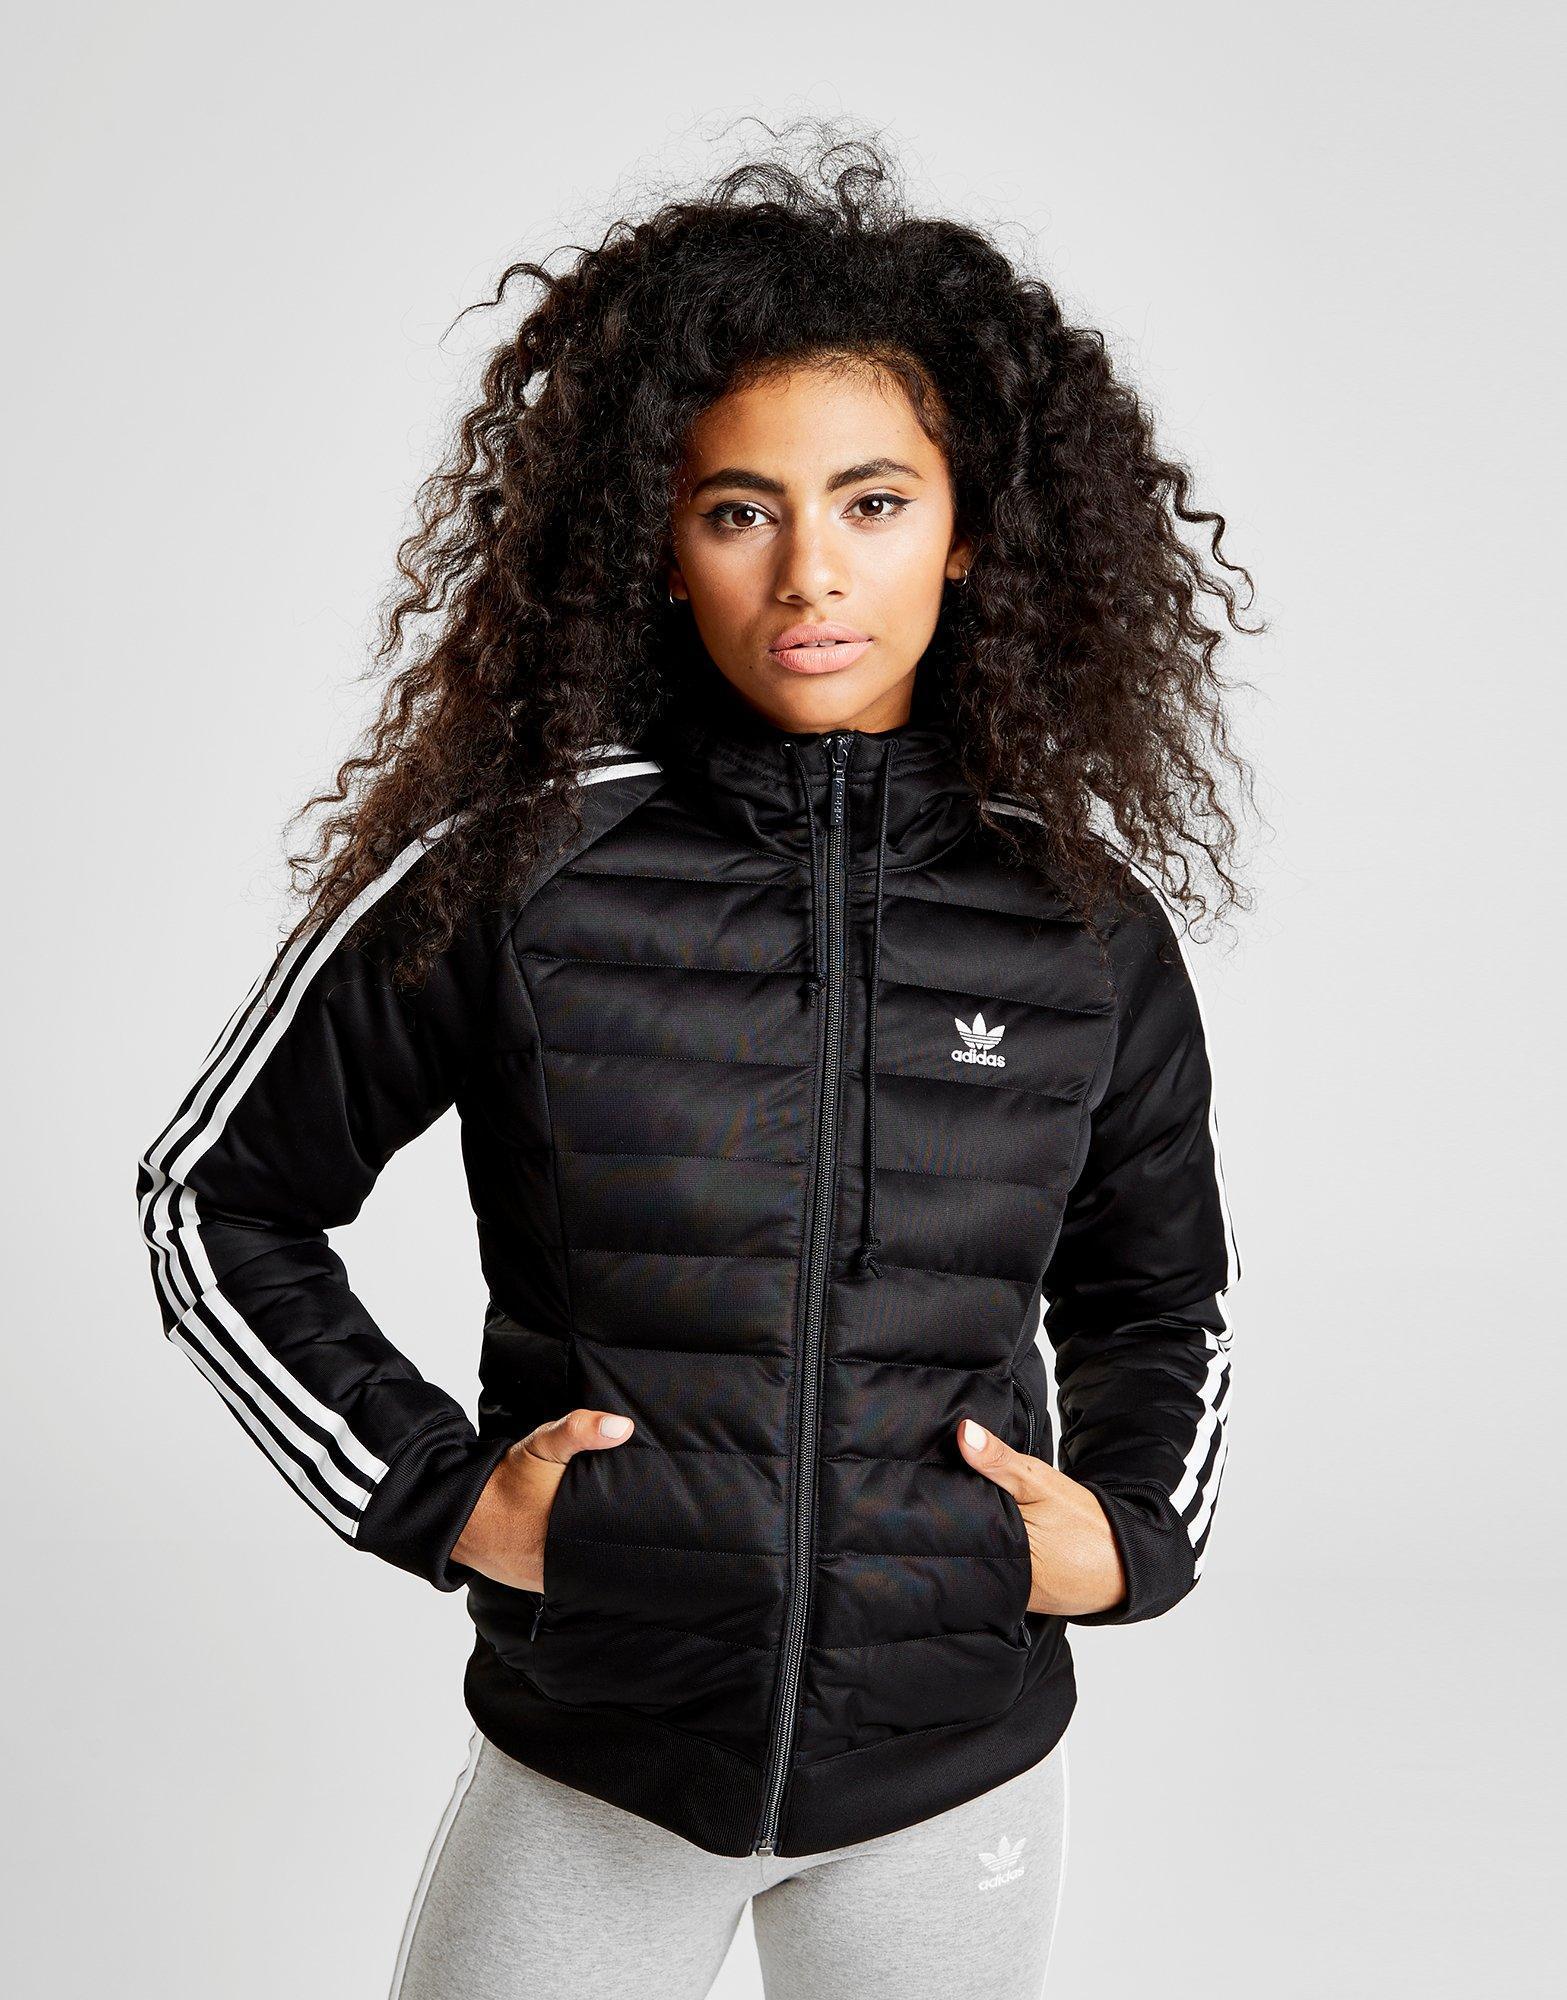 Adidas Stripes Jacket Originals Black 3 Padded jL34RqA5